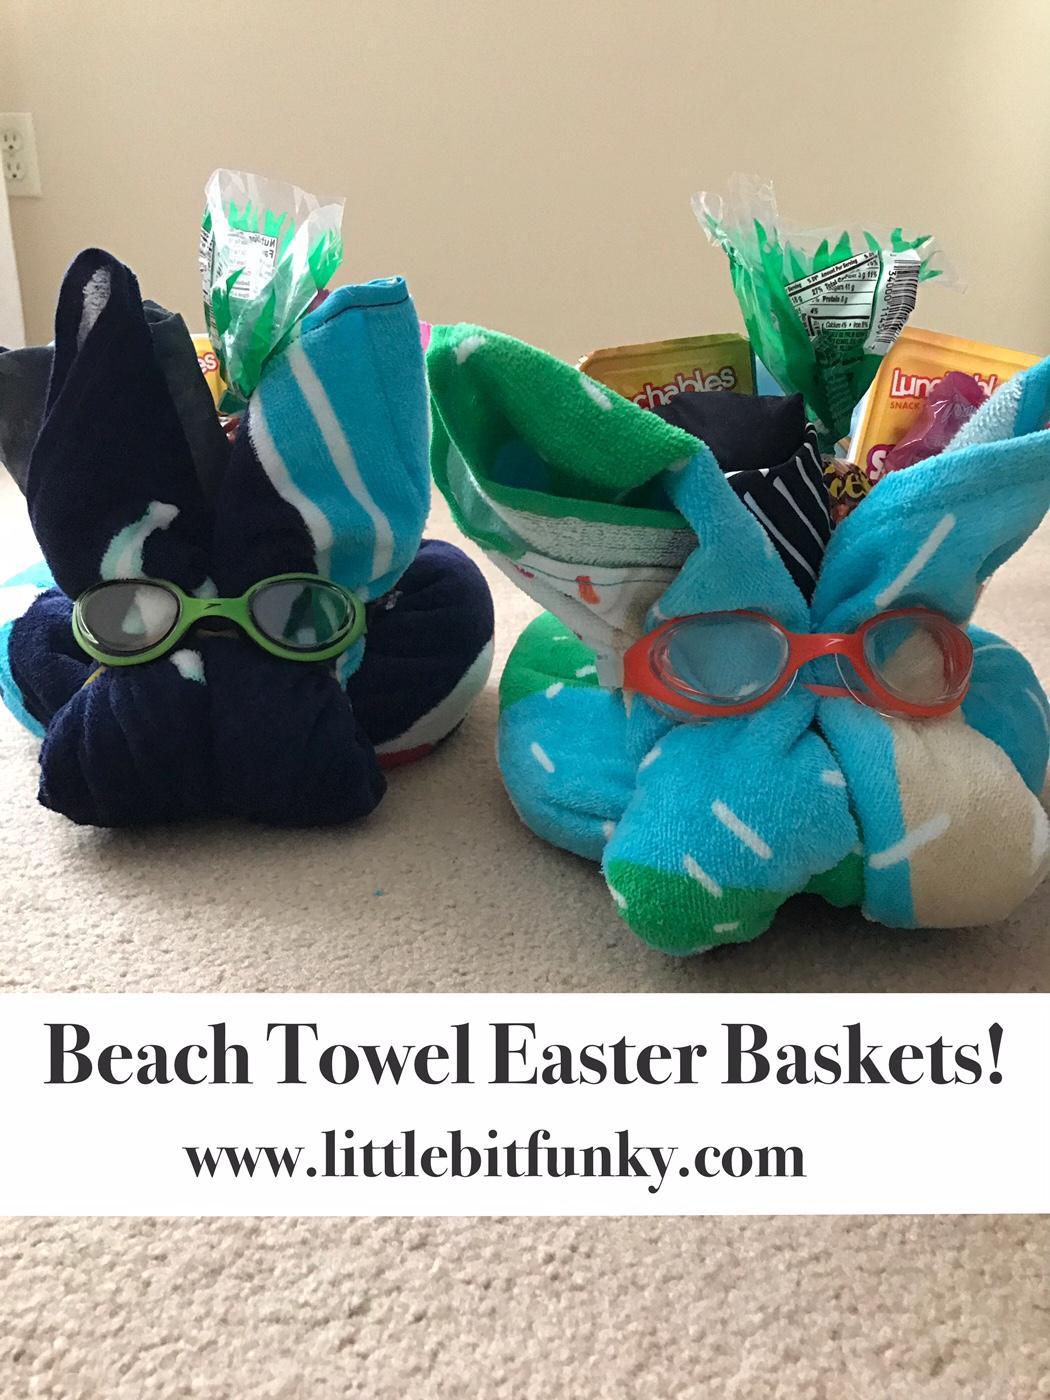 Beach Towel Basket